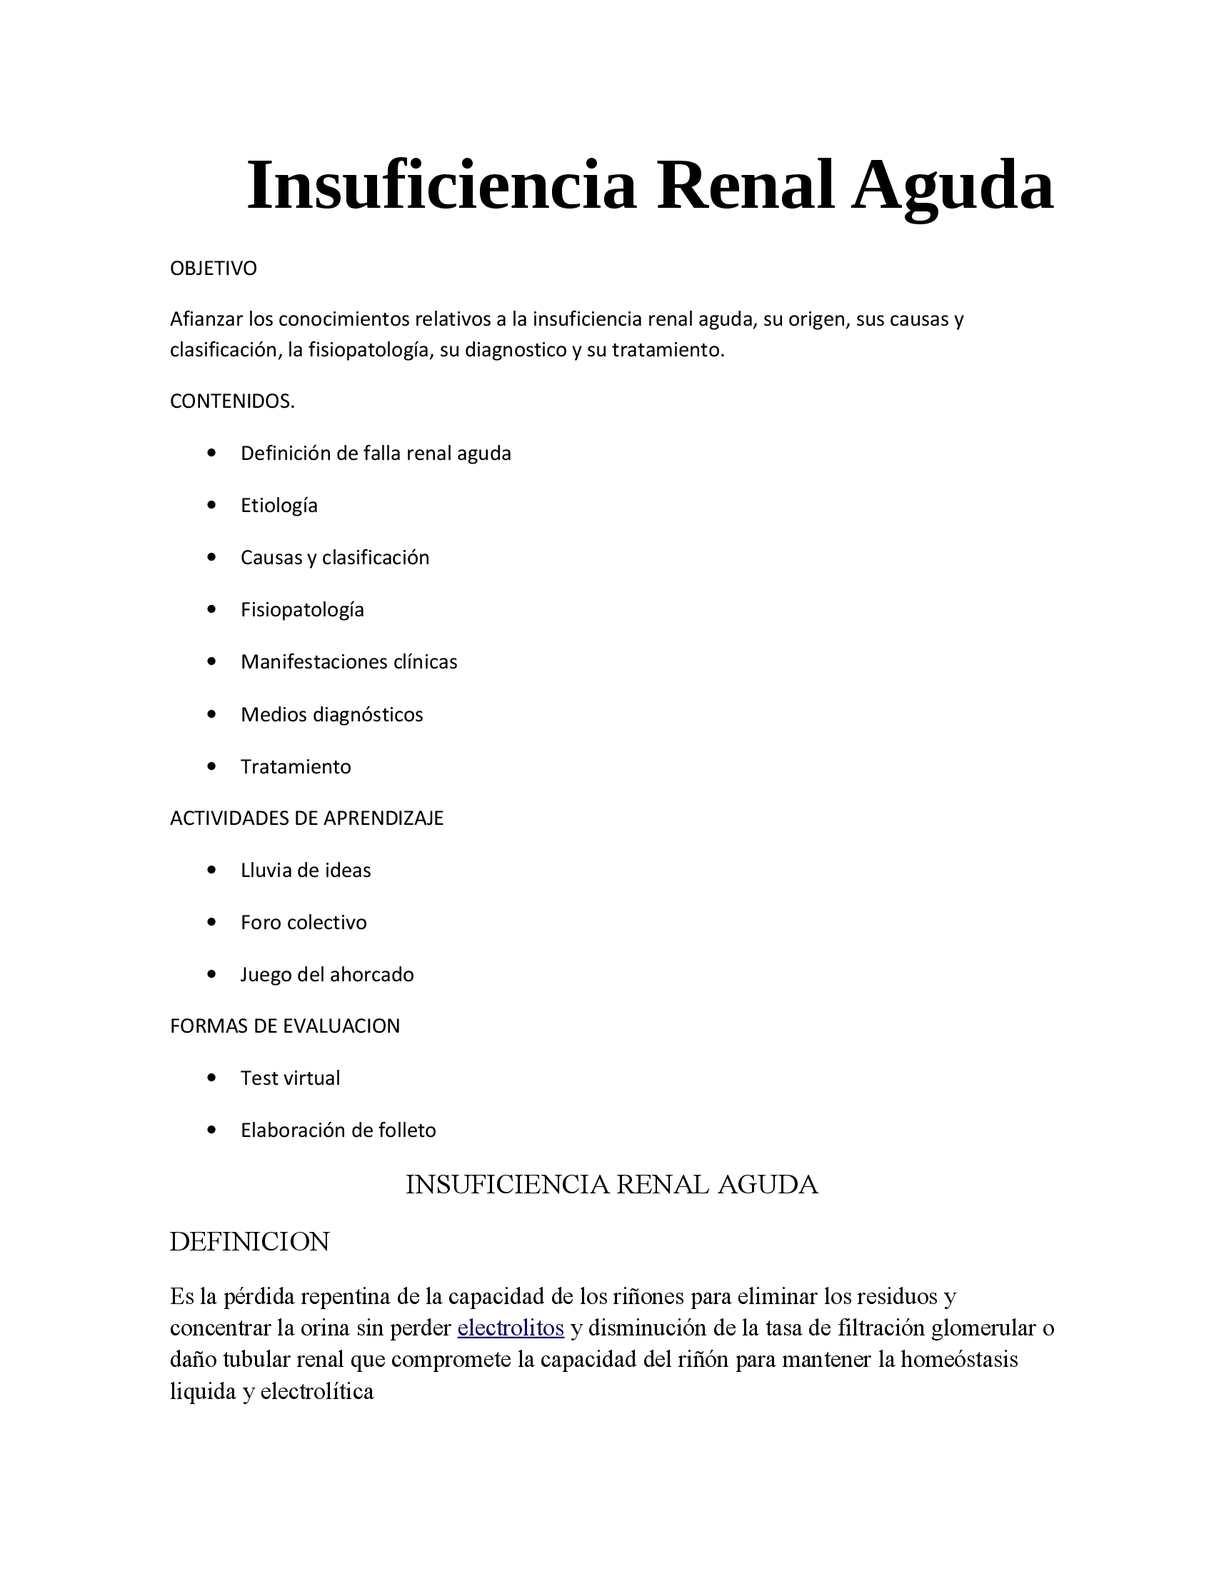 diagnostico de laboratorio de insuficiencia renal